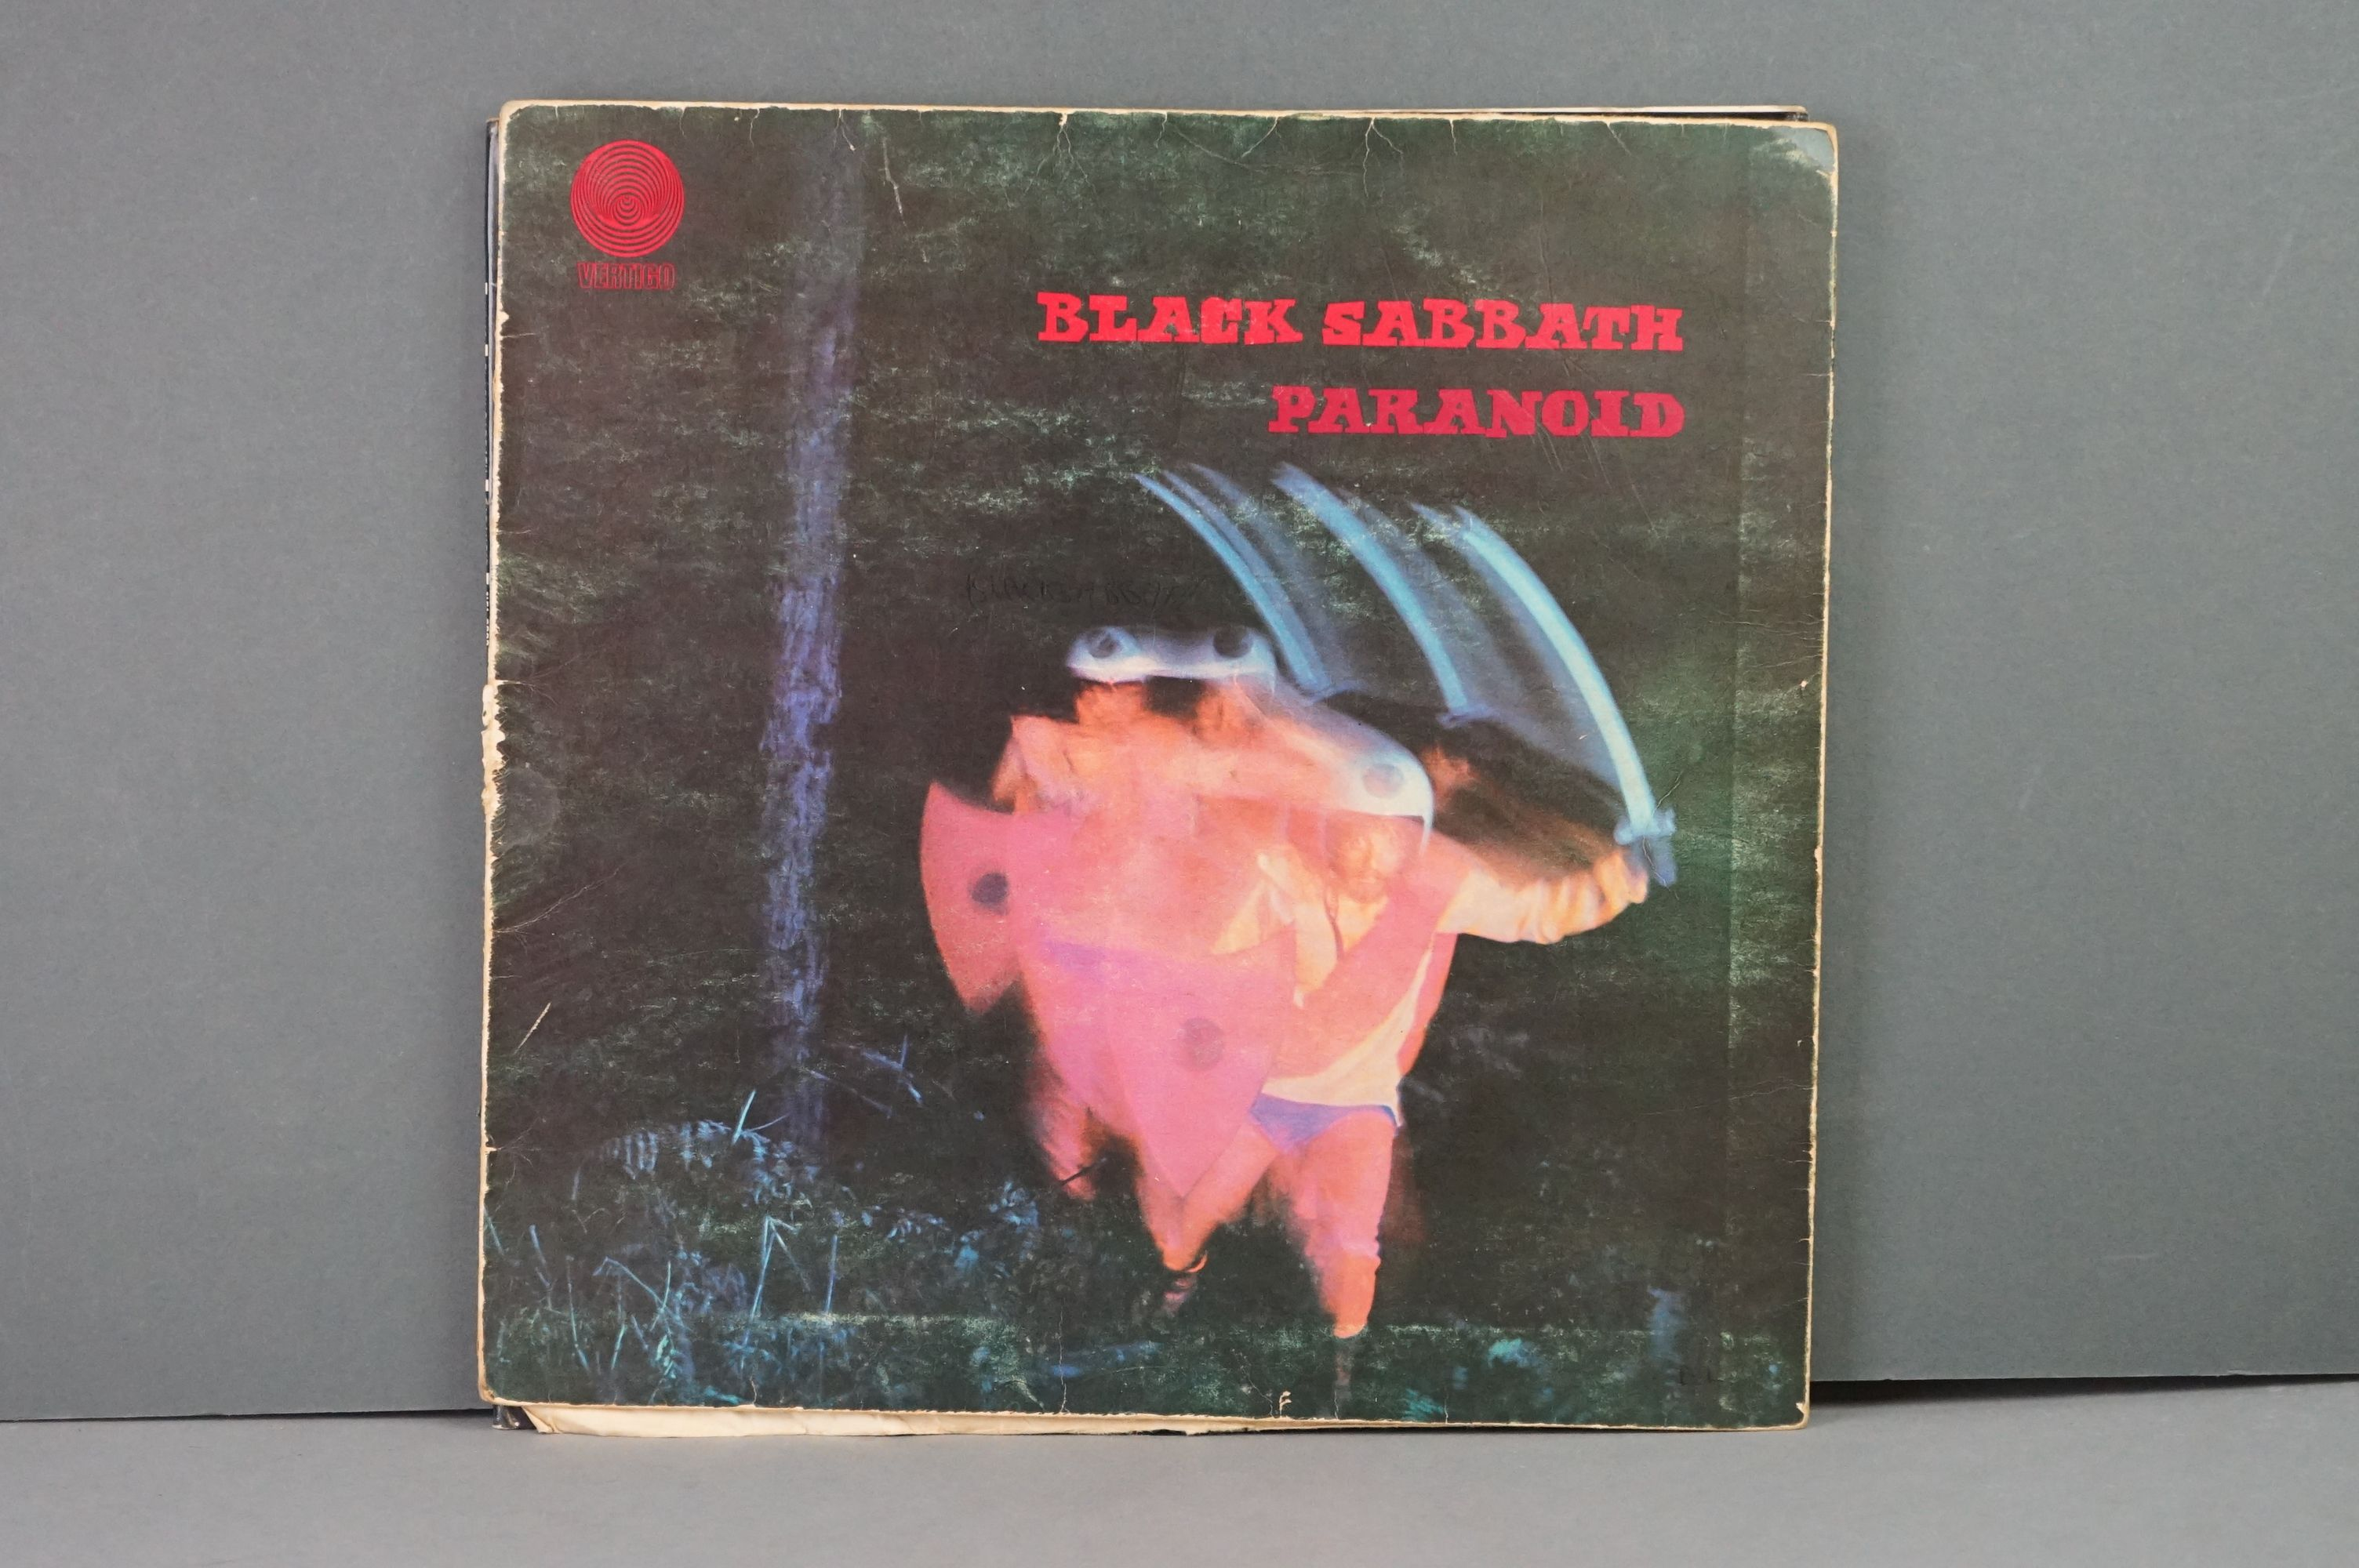 Vinyl - Twelve Black Sabbath vinyl LP's to include Technical Ecstasy (Vertigo Records PRICE 40), - Image 15 of 17